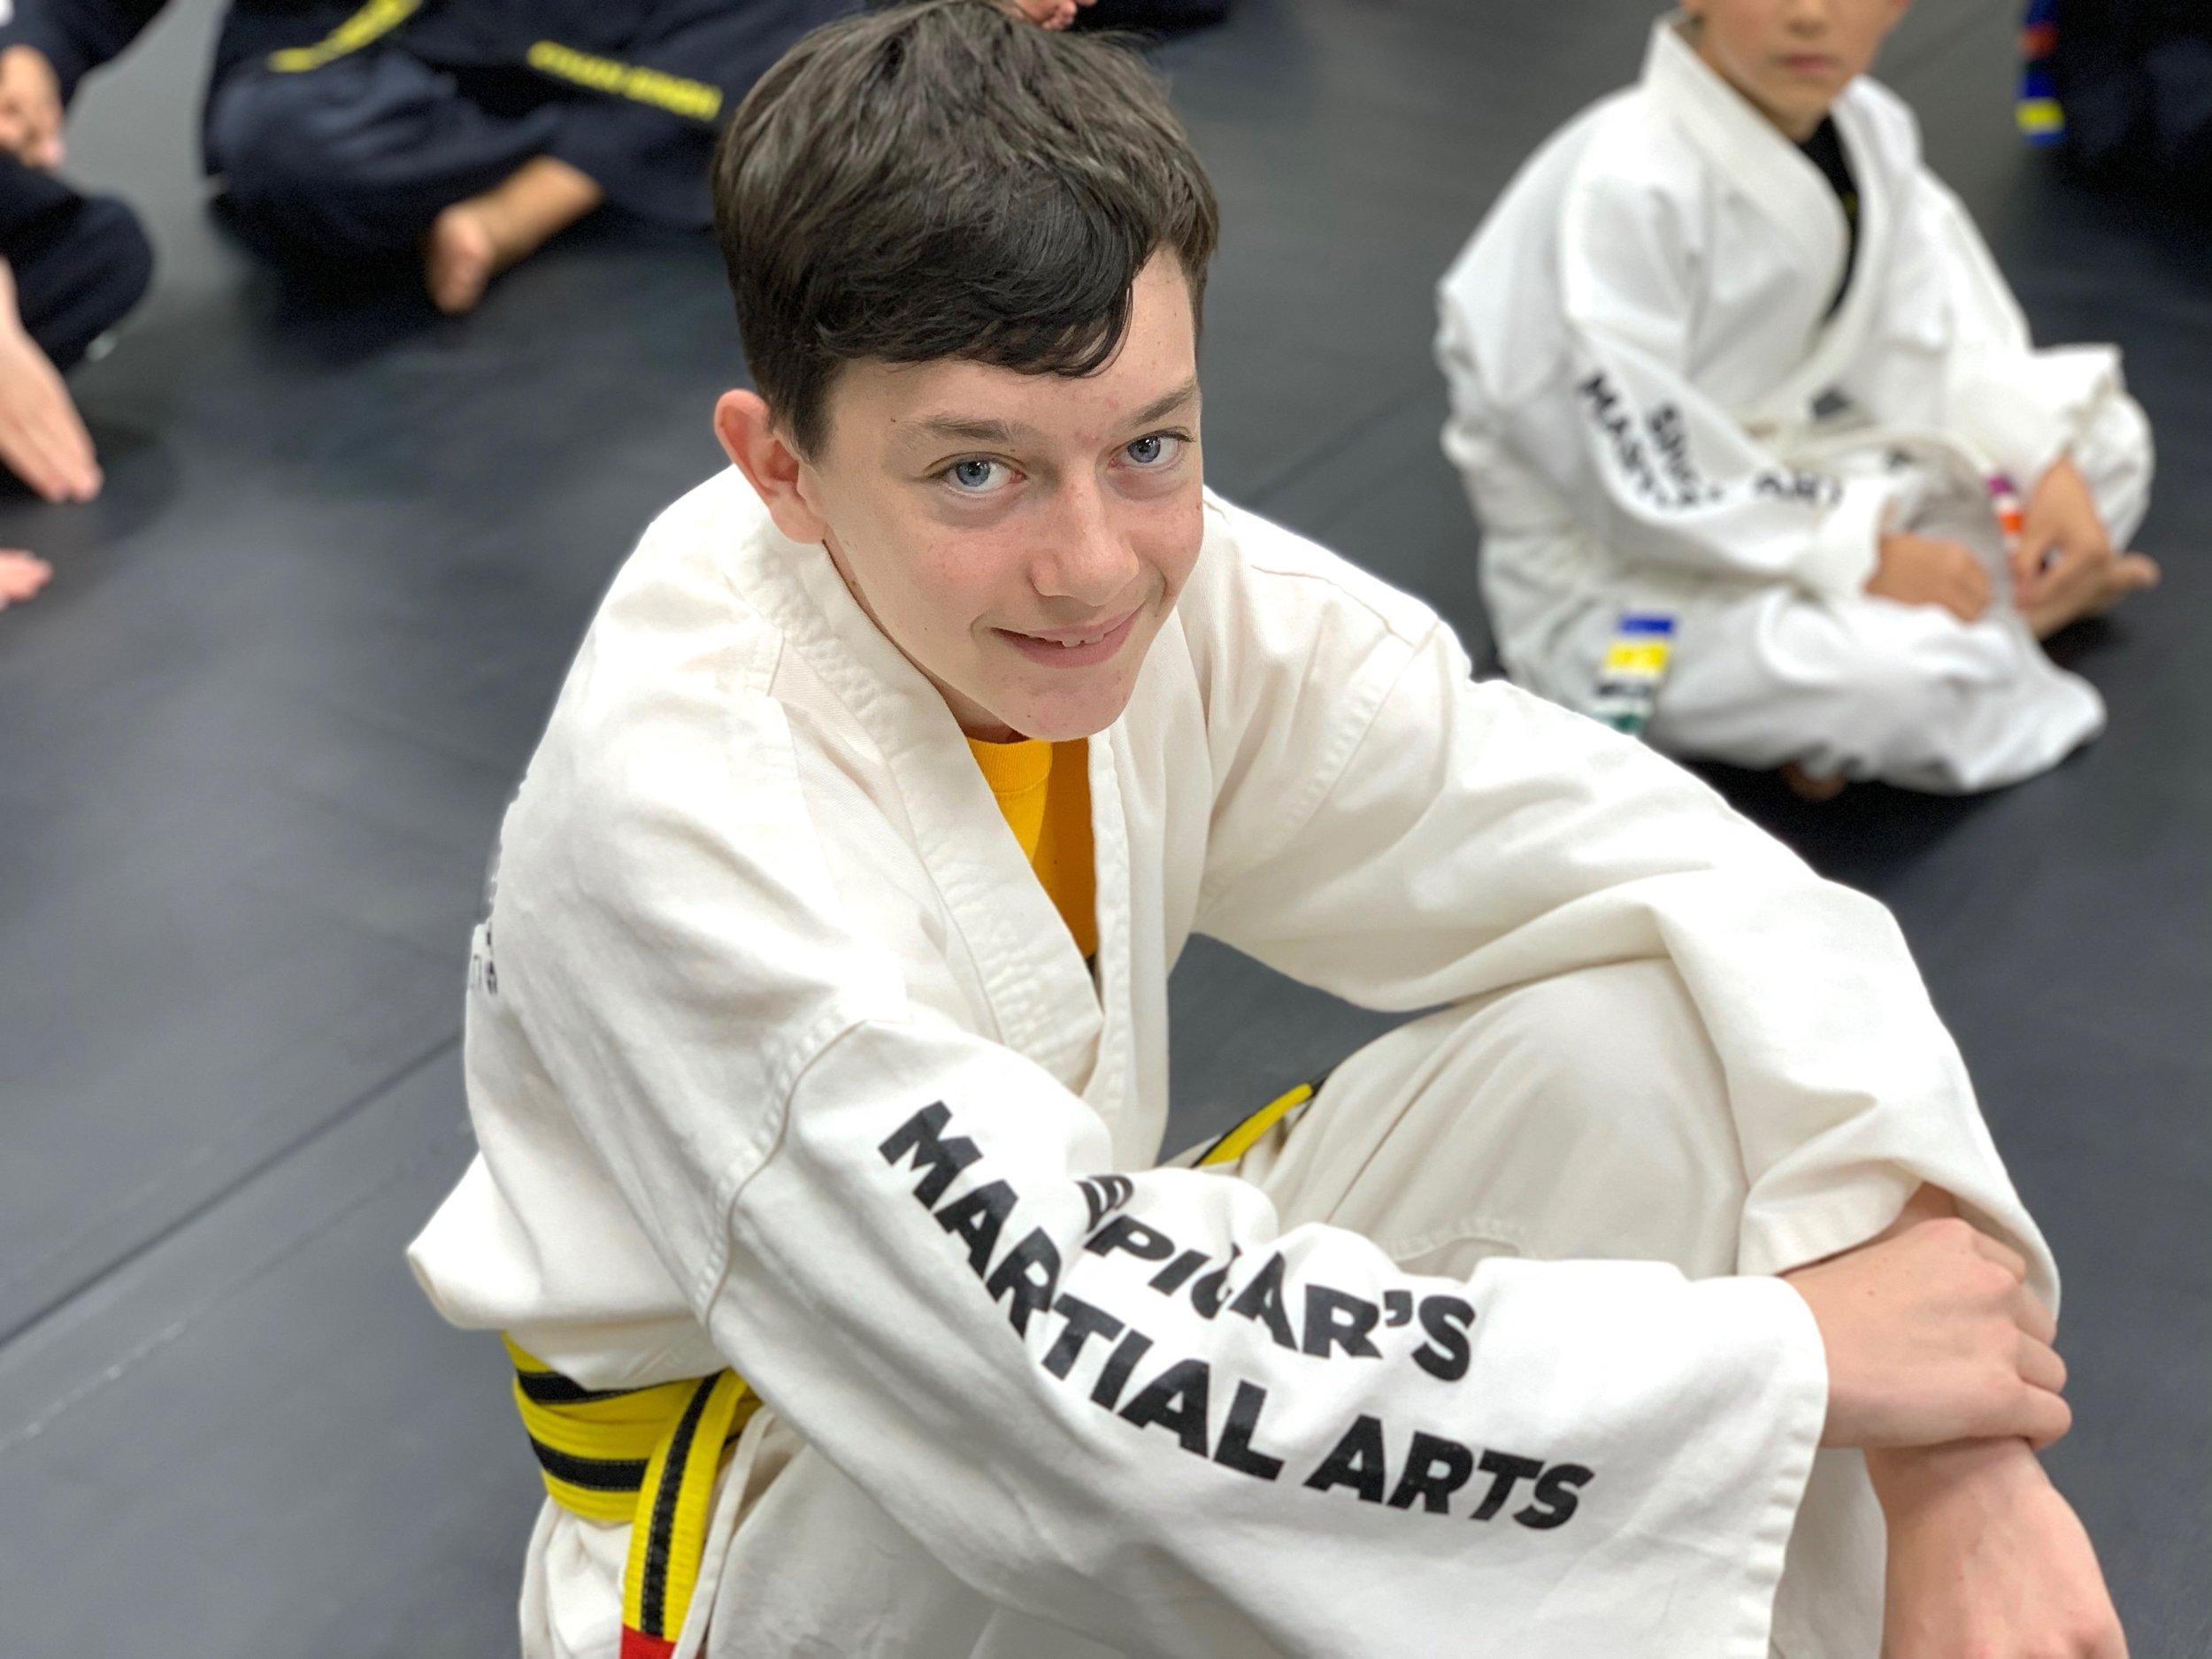 karate-kids-program-souhtlake-keller-grapevine-texas00044.jpeg